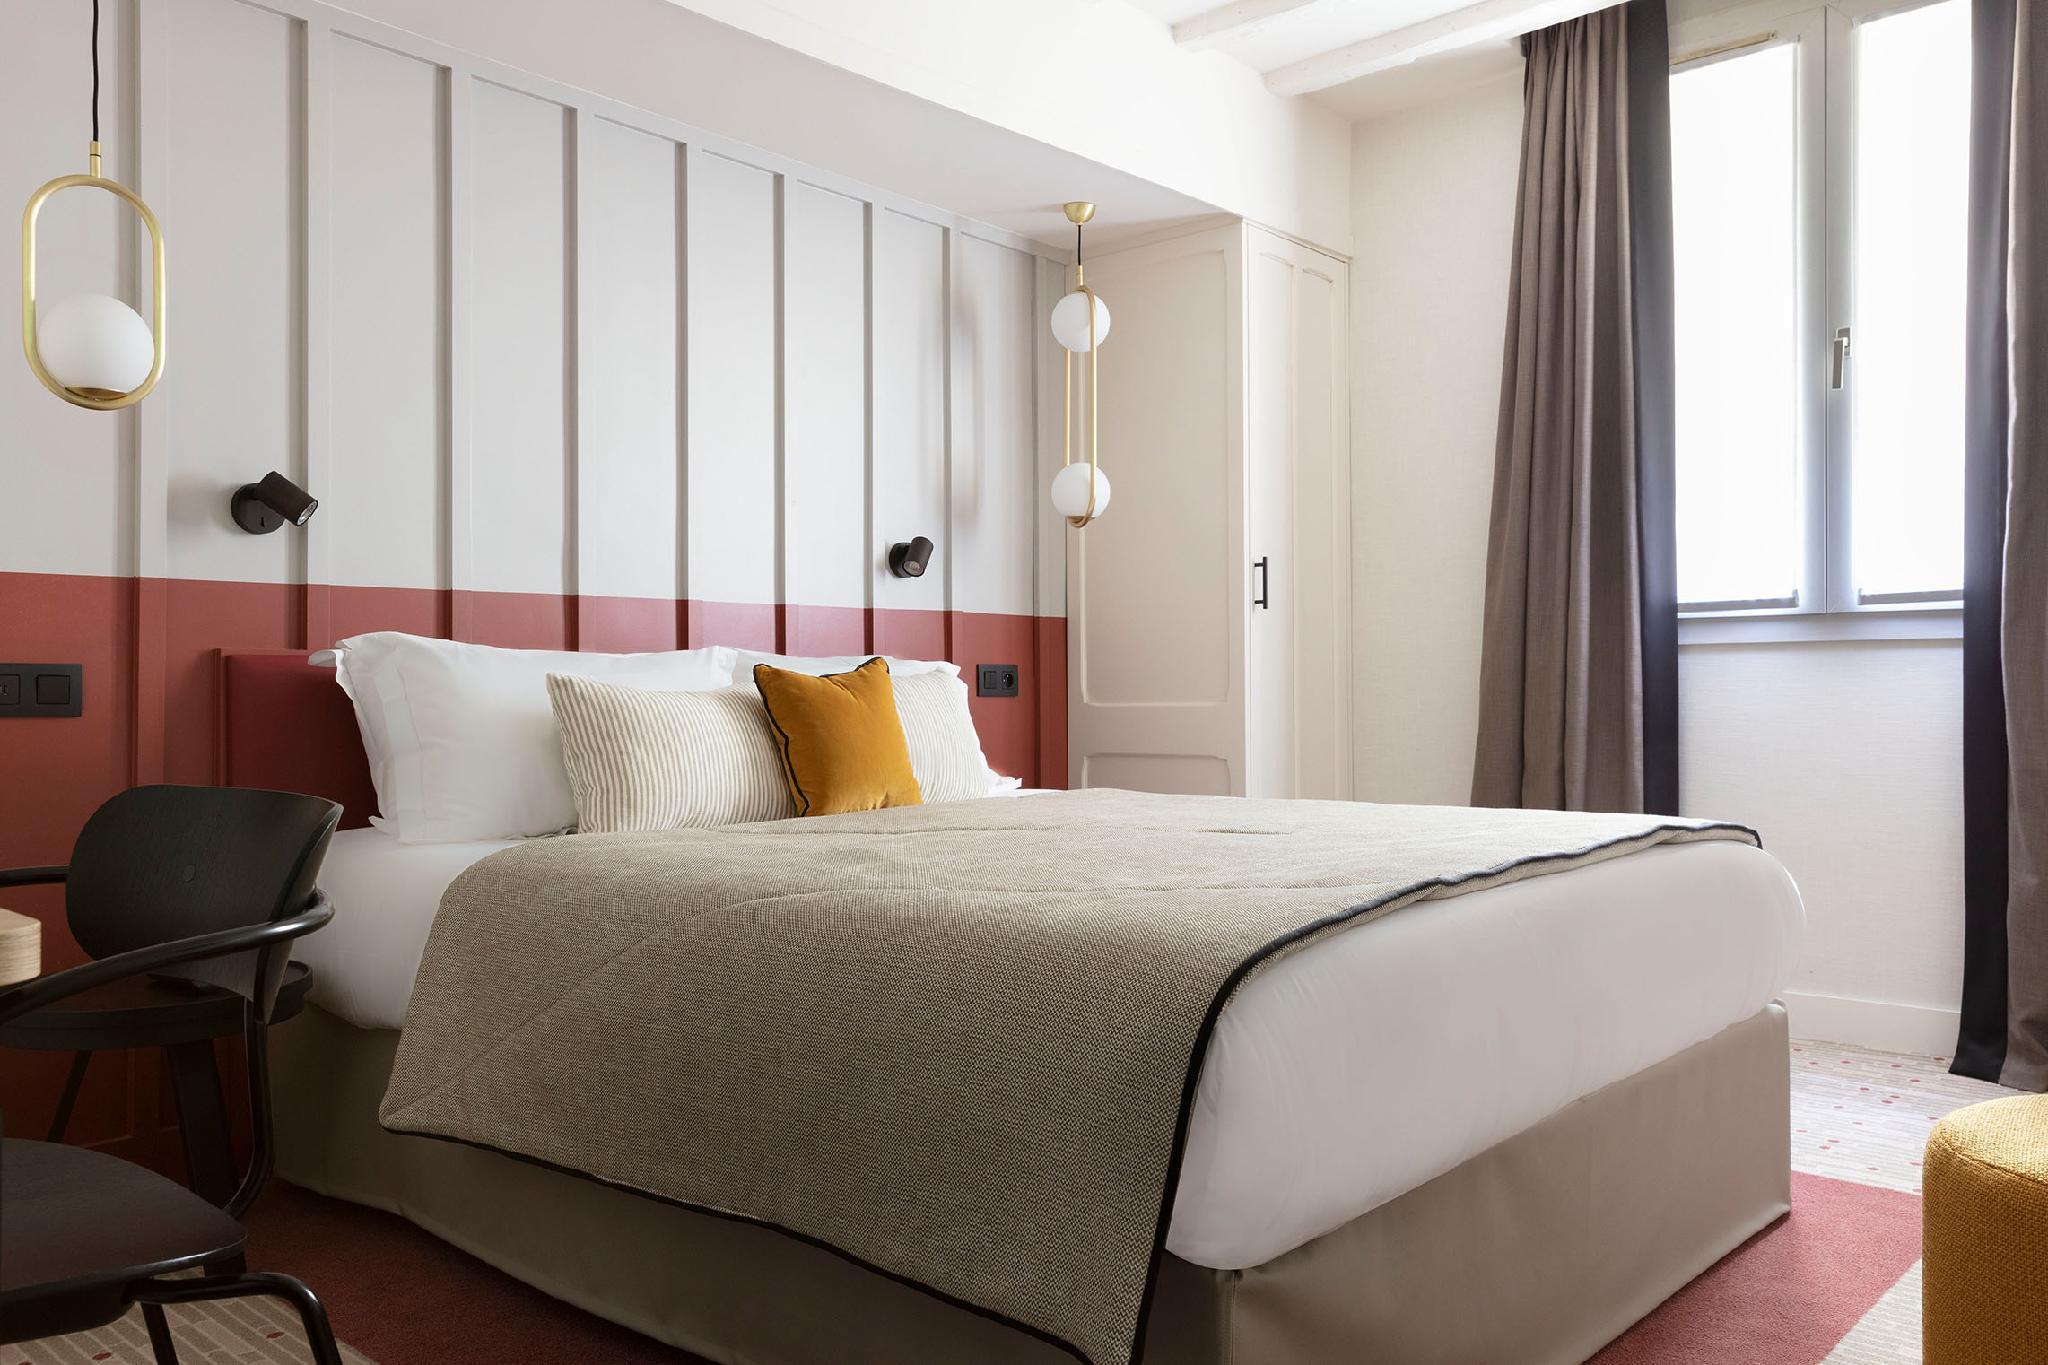 Hotel Bastille Speria in Paris - Room Deals, Photos & Reviews